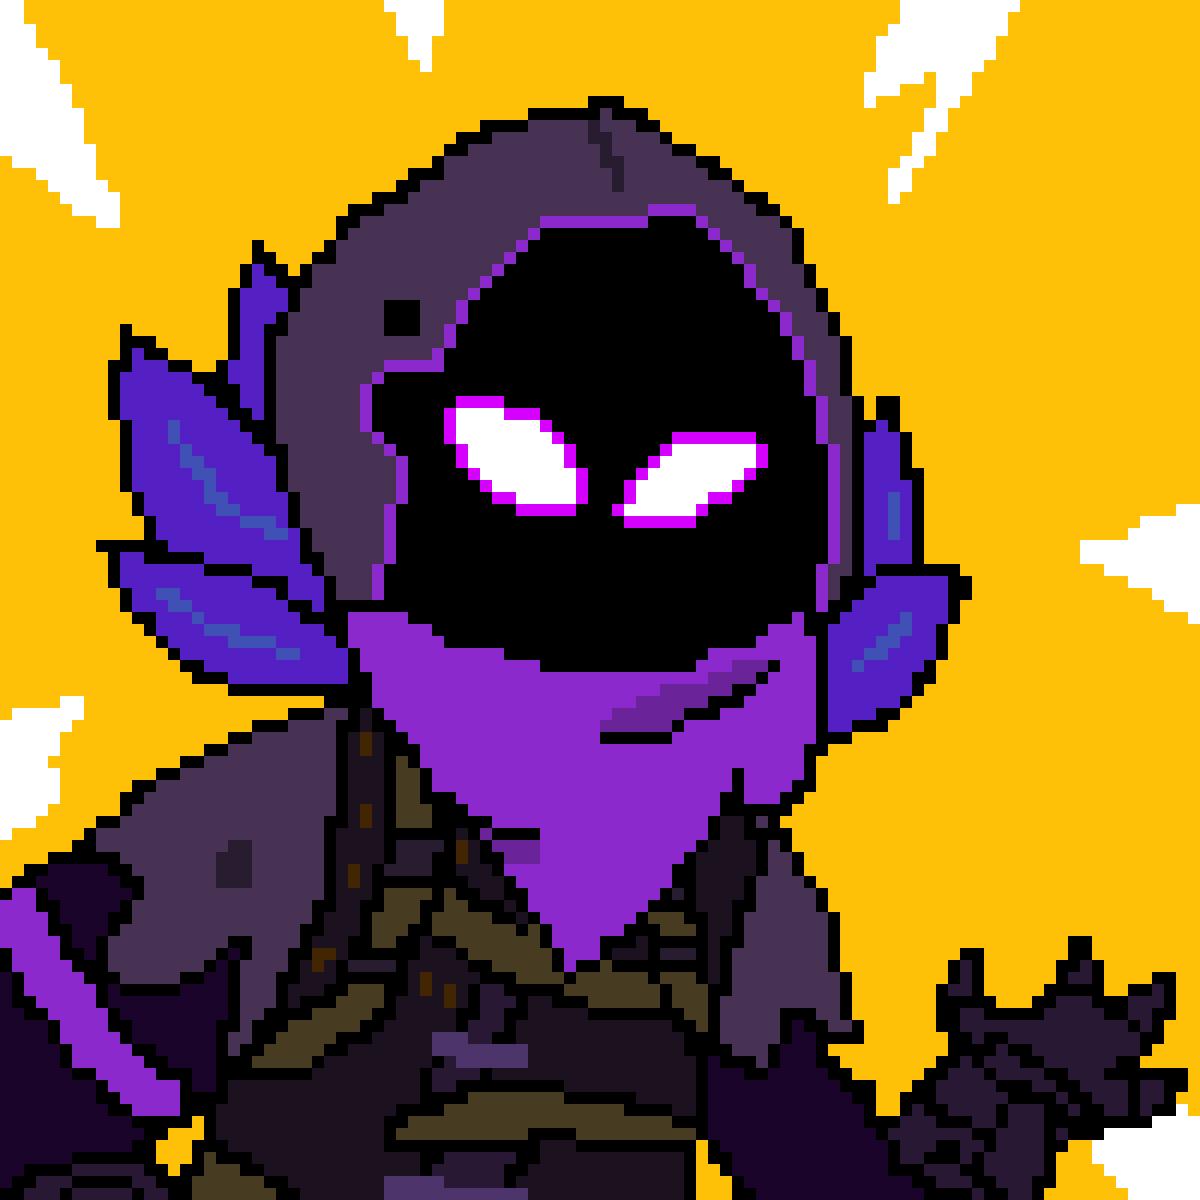 Pixilart Raven Fortnite Battle Royale By Theucproject